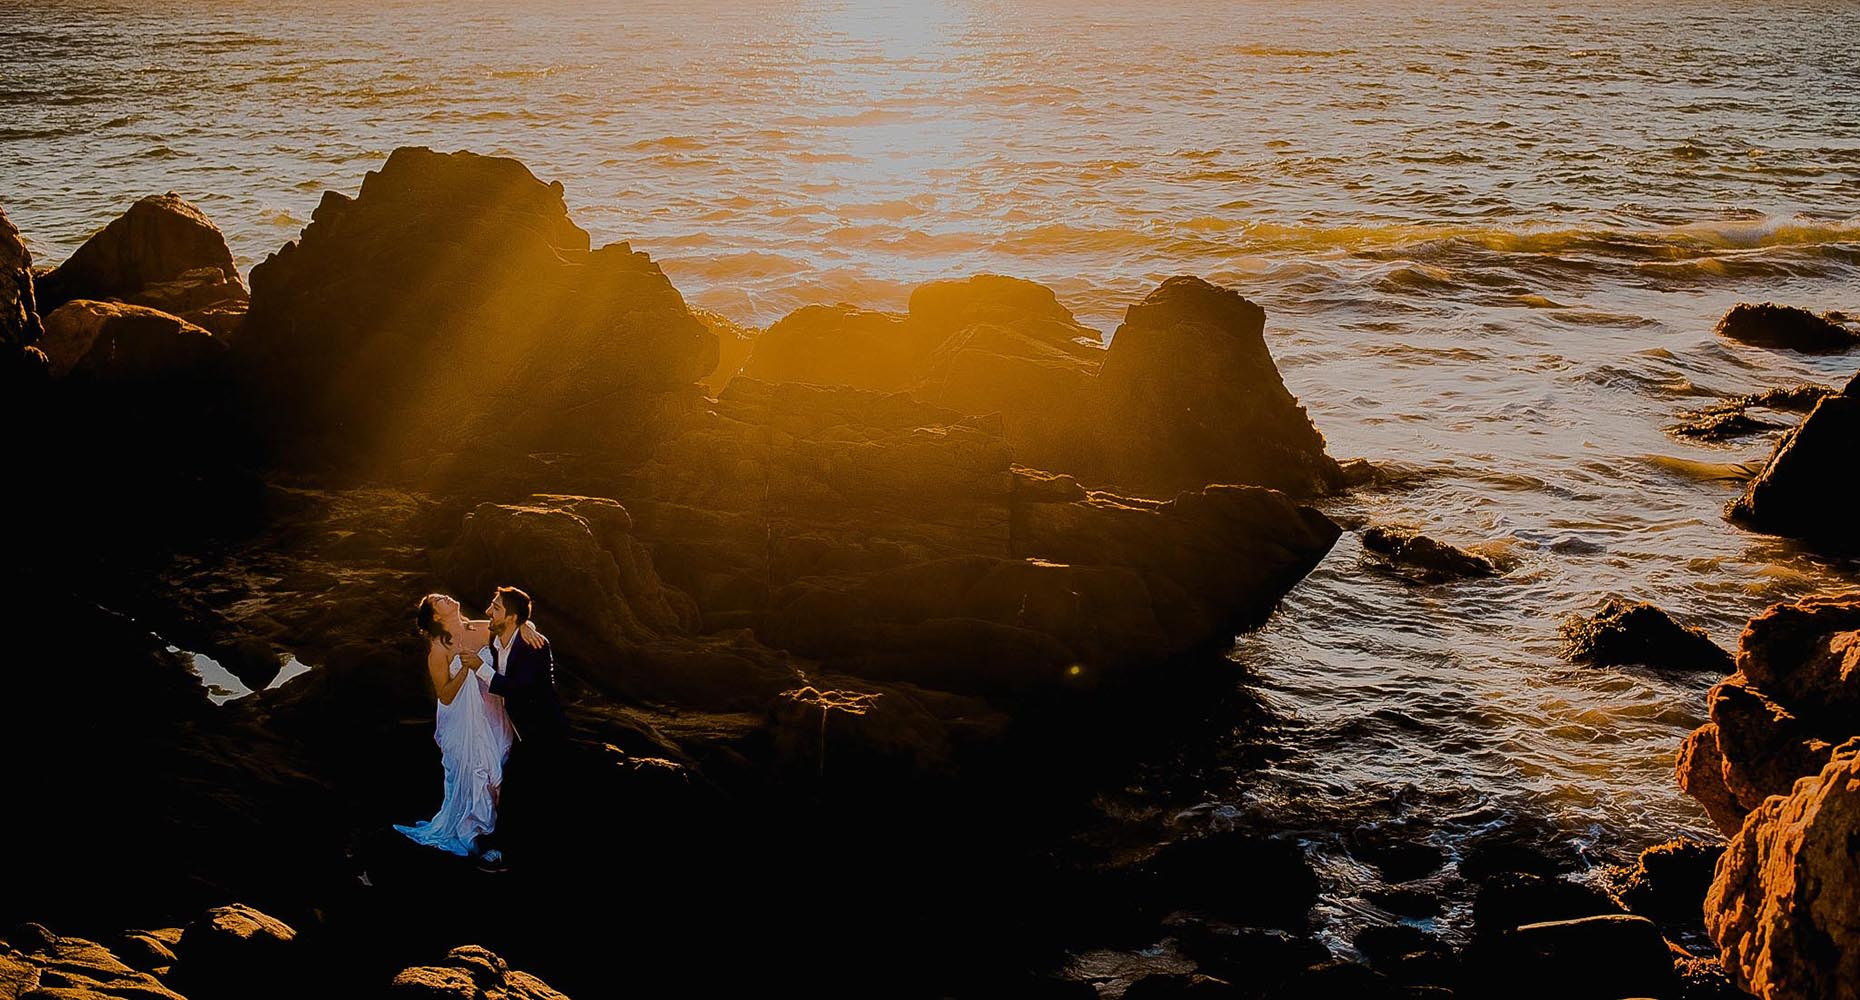 Fotografo de matrimonios e chile y Argentina marcos llanos